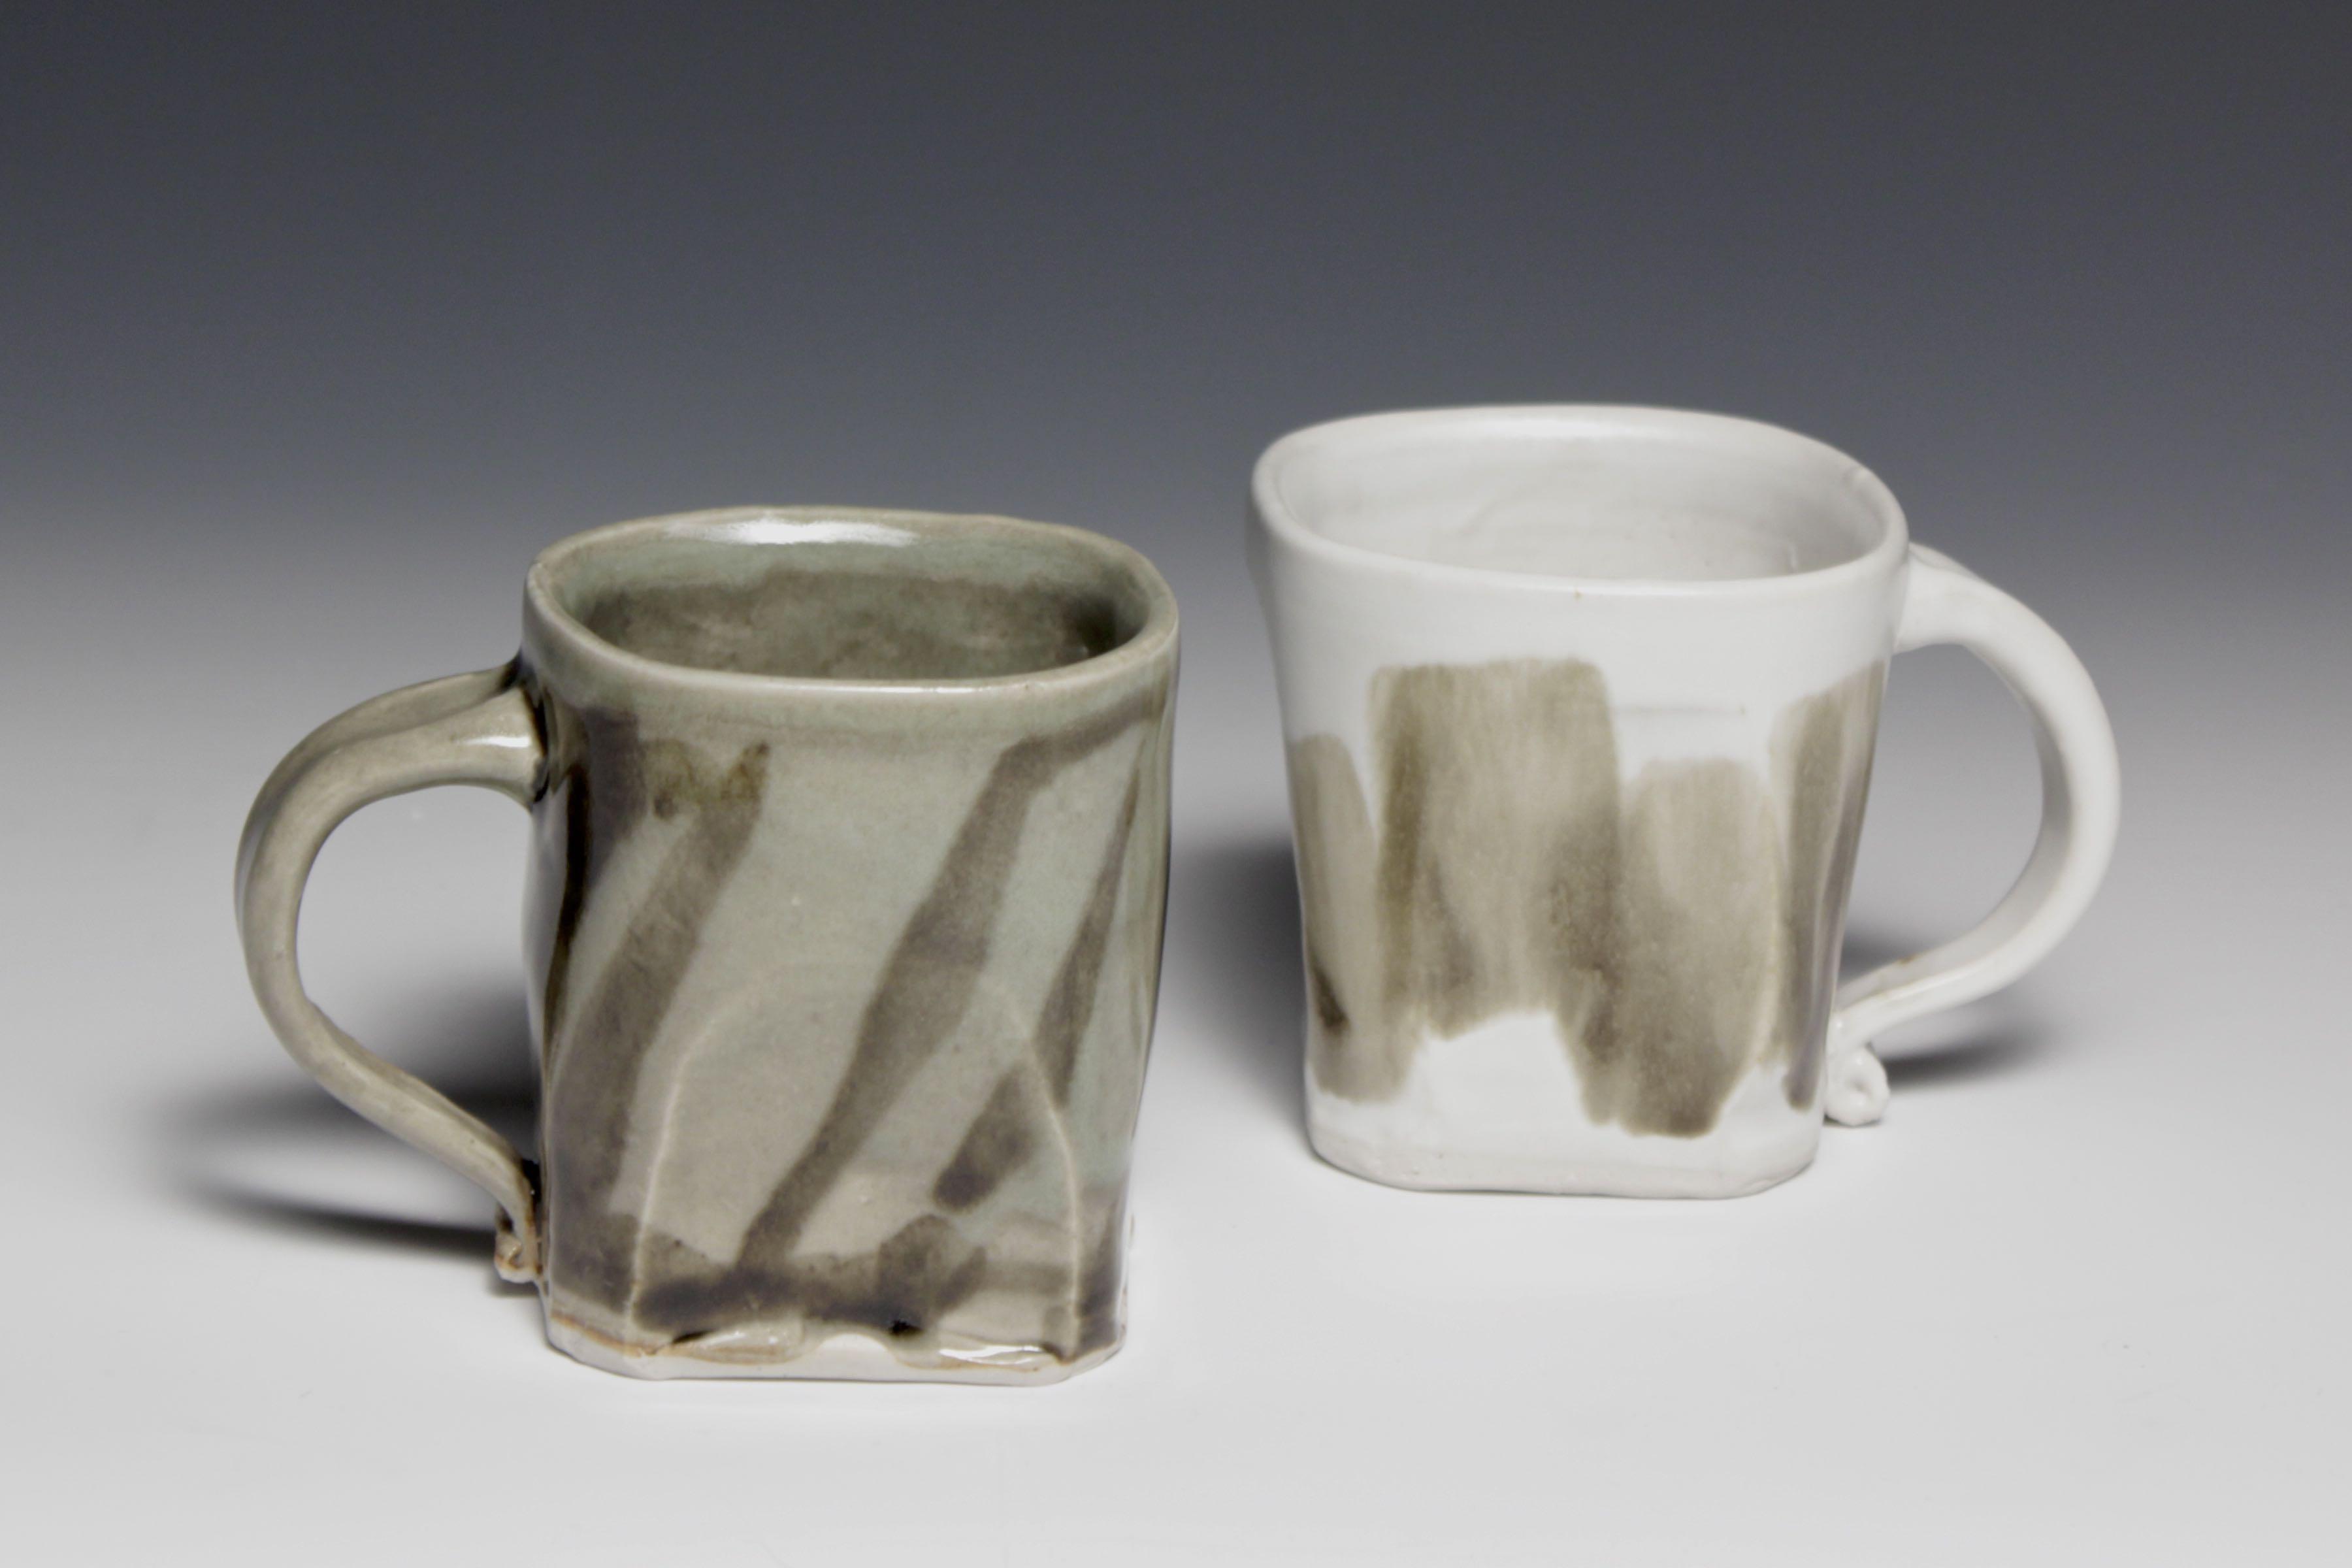 Square Mugs